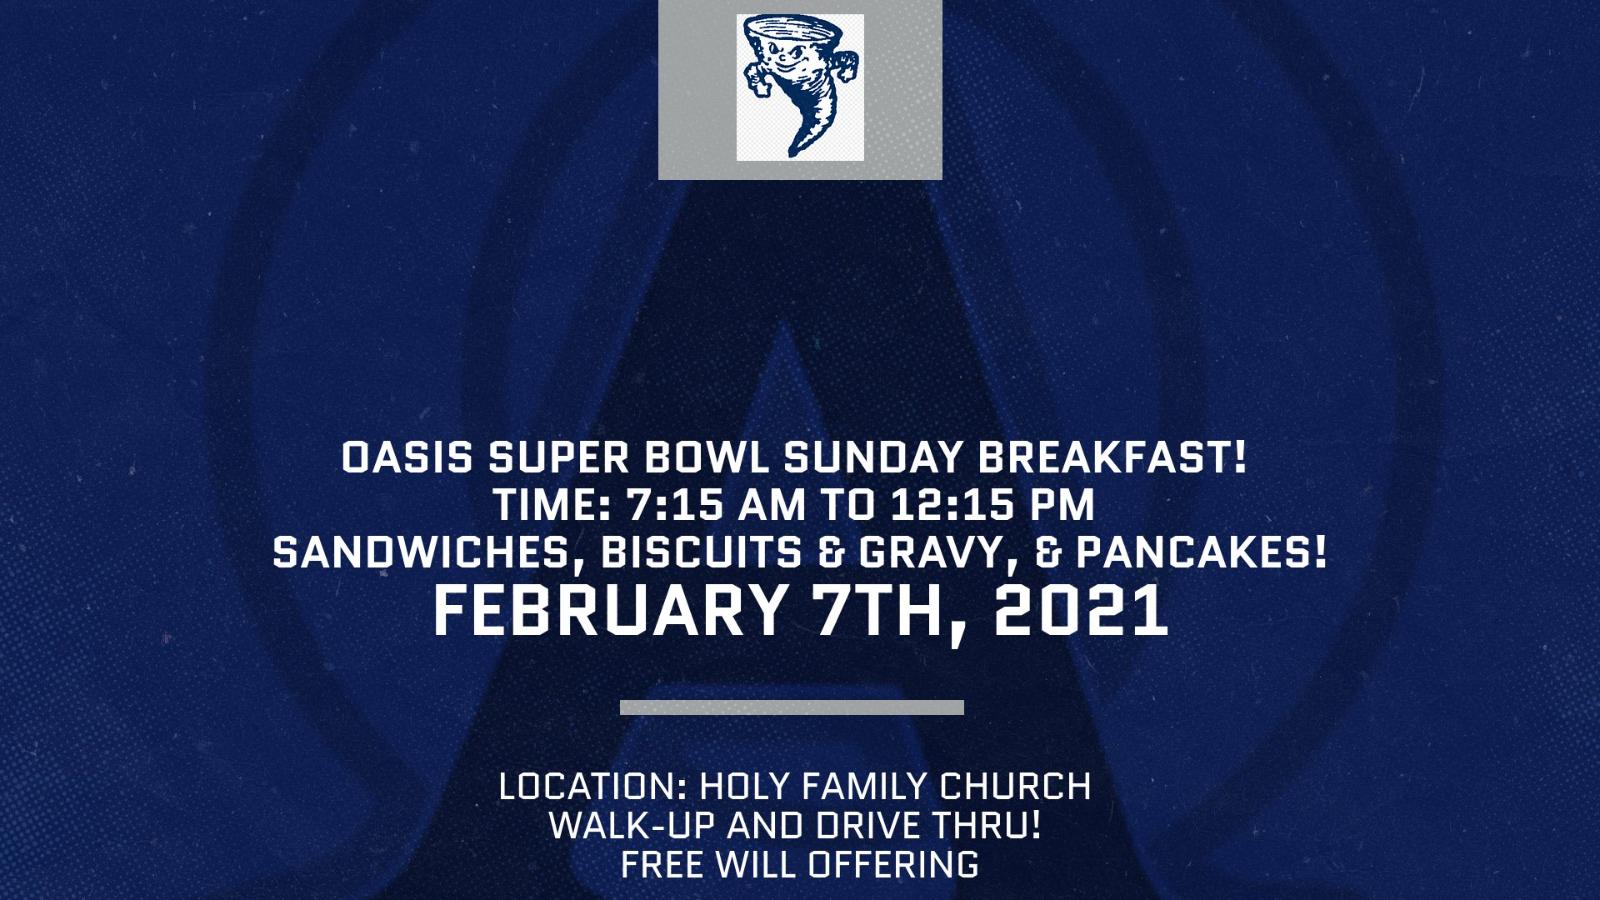 OASIS Super Bowl Breakfast